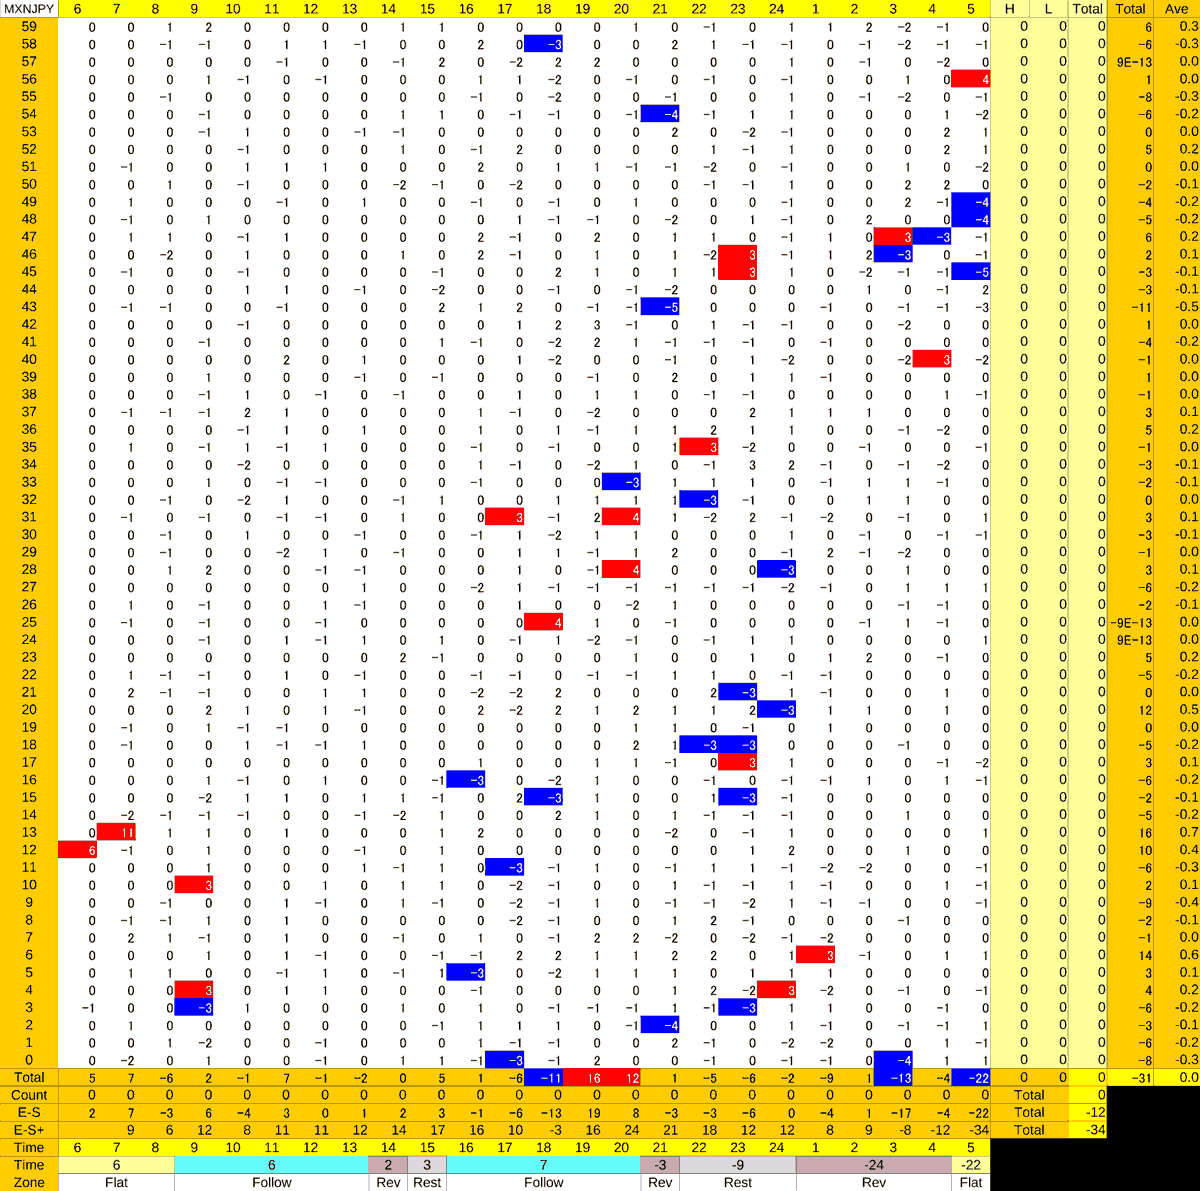 20201027_HS(3)MXNJPY